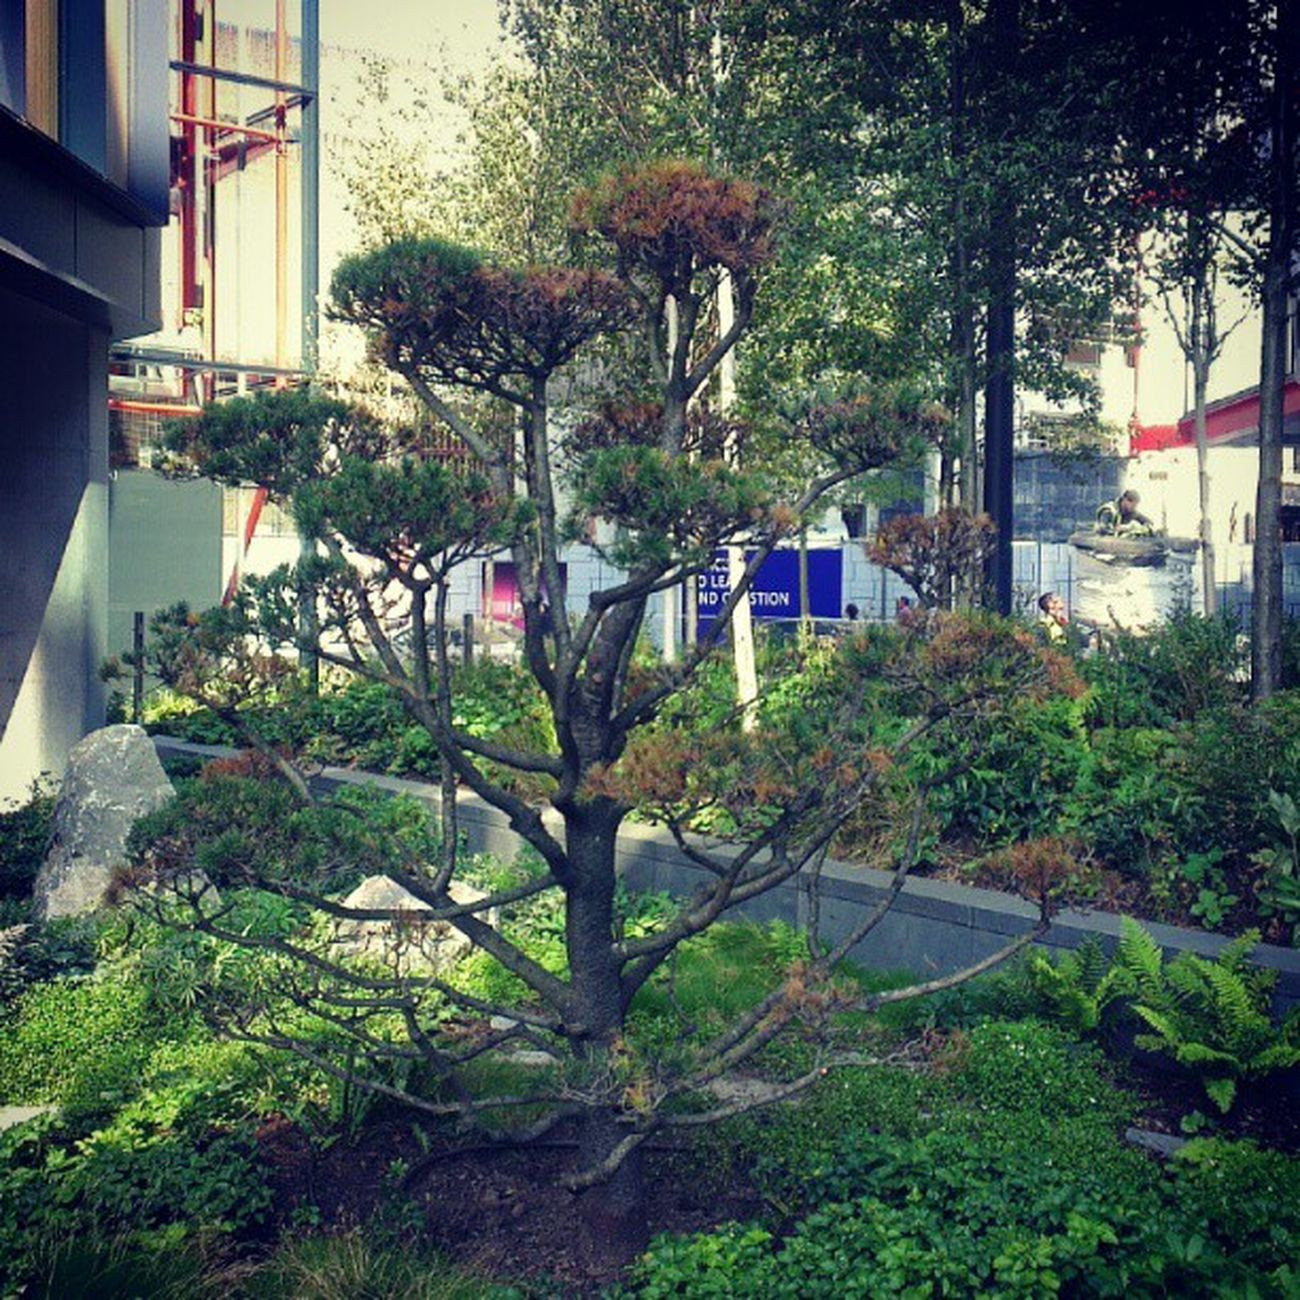 Neo Bankside Garden. Neobankside Southbank Southwark  London xpro